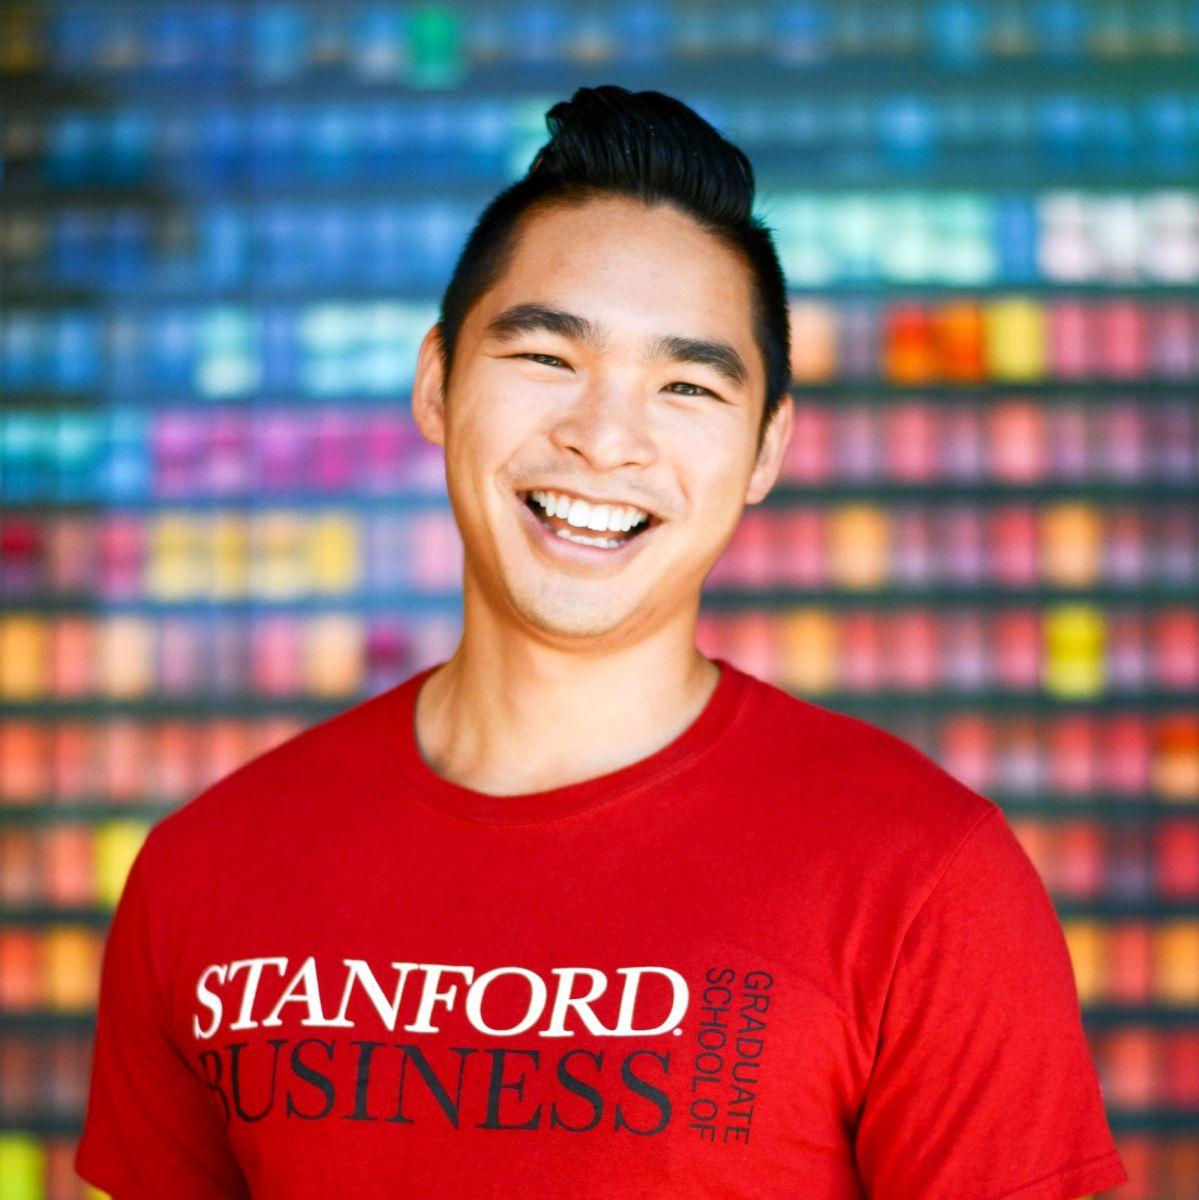 Bioengineering alumnus named to Forbes 30 Under 30